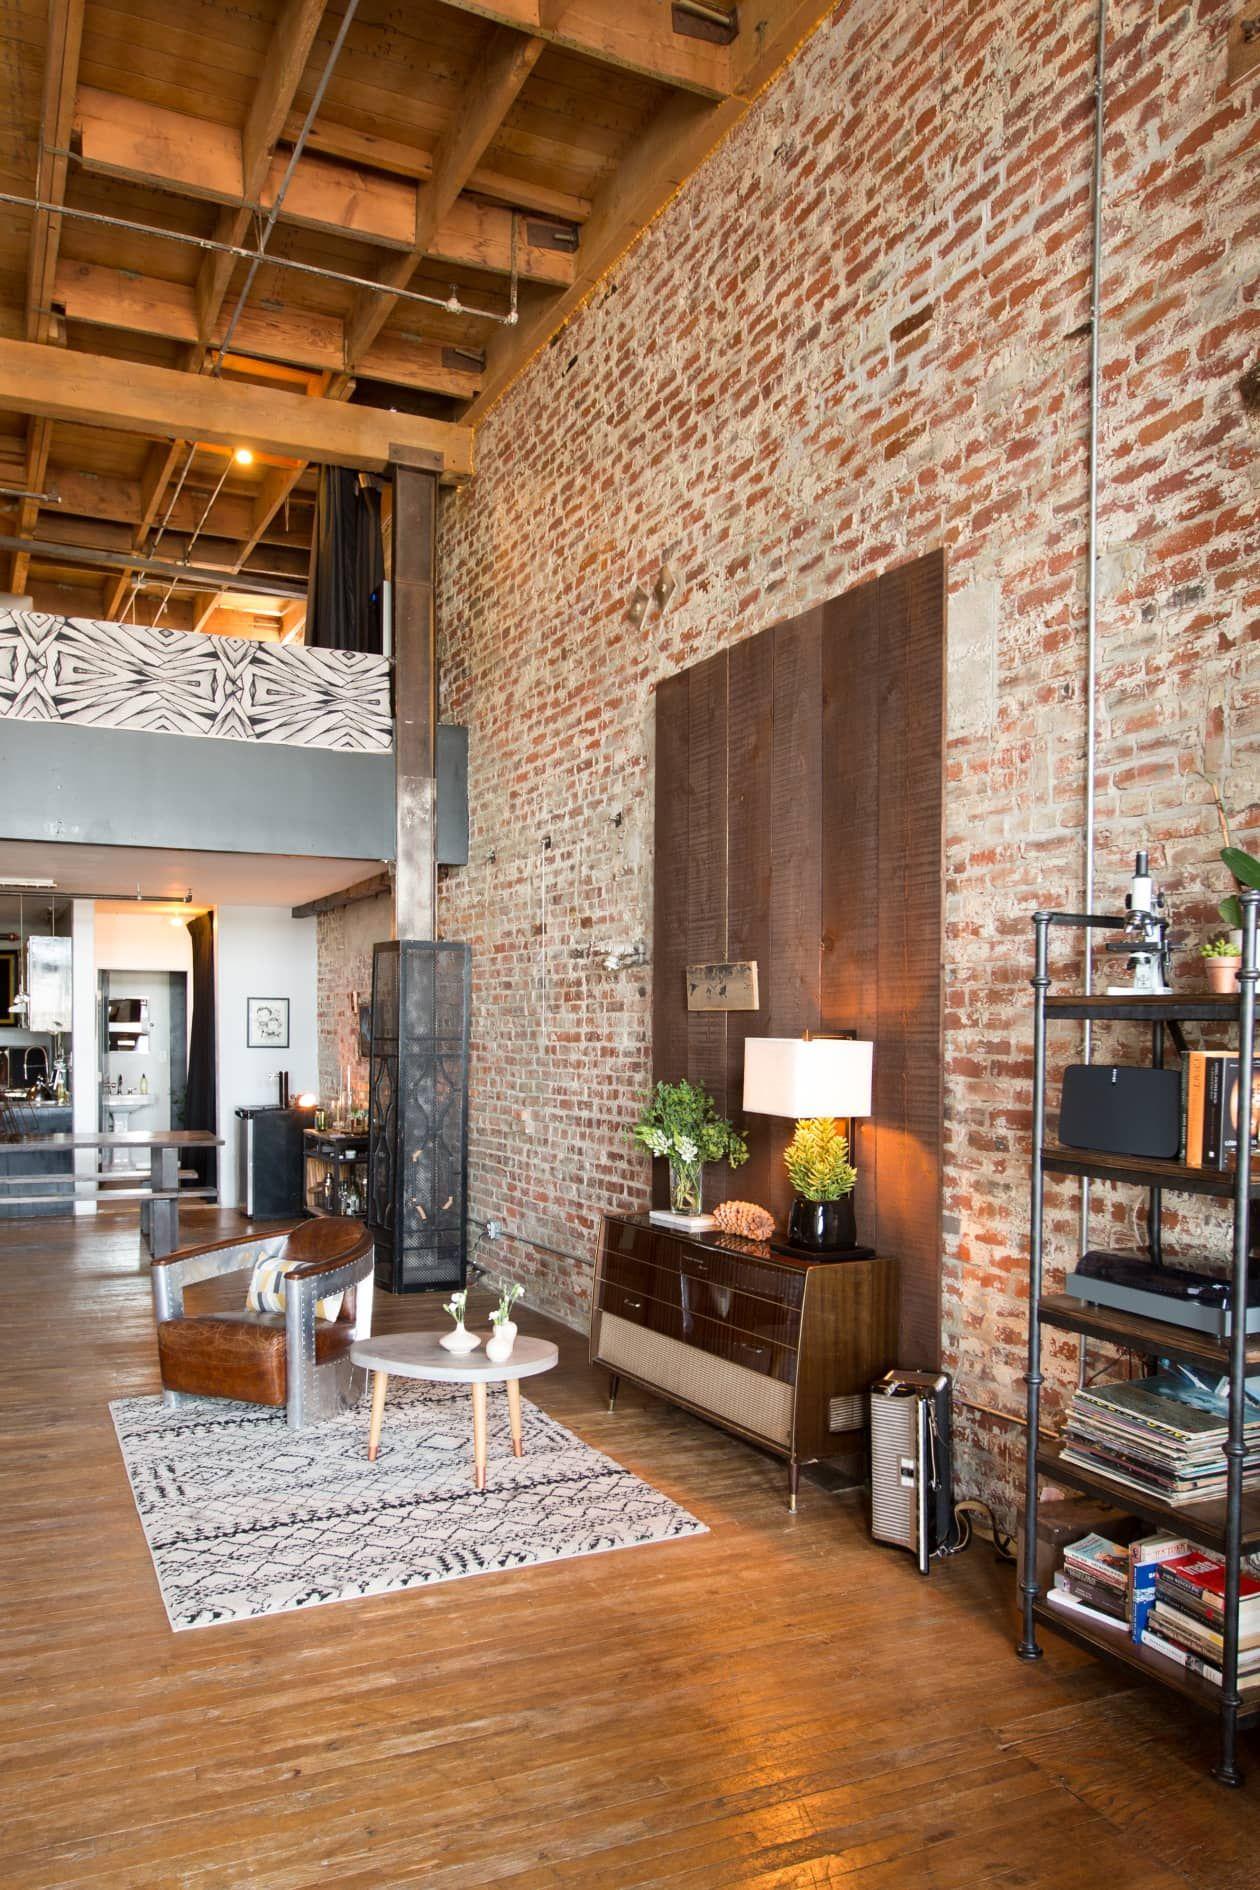 Amber Ryan S Make It Work Loft Brick Loft The Brick Furniture Exposed Brick Walls